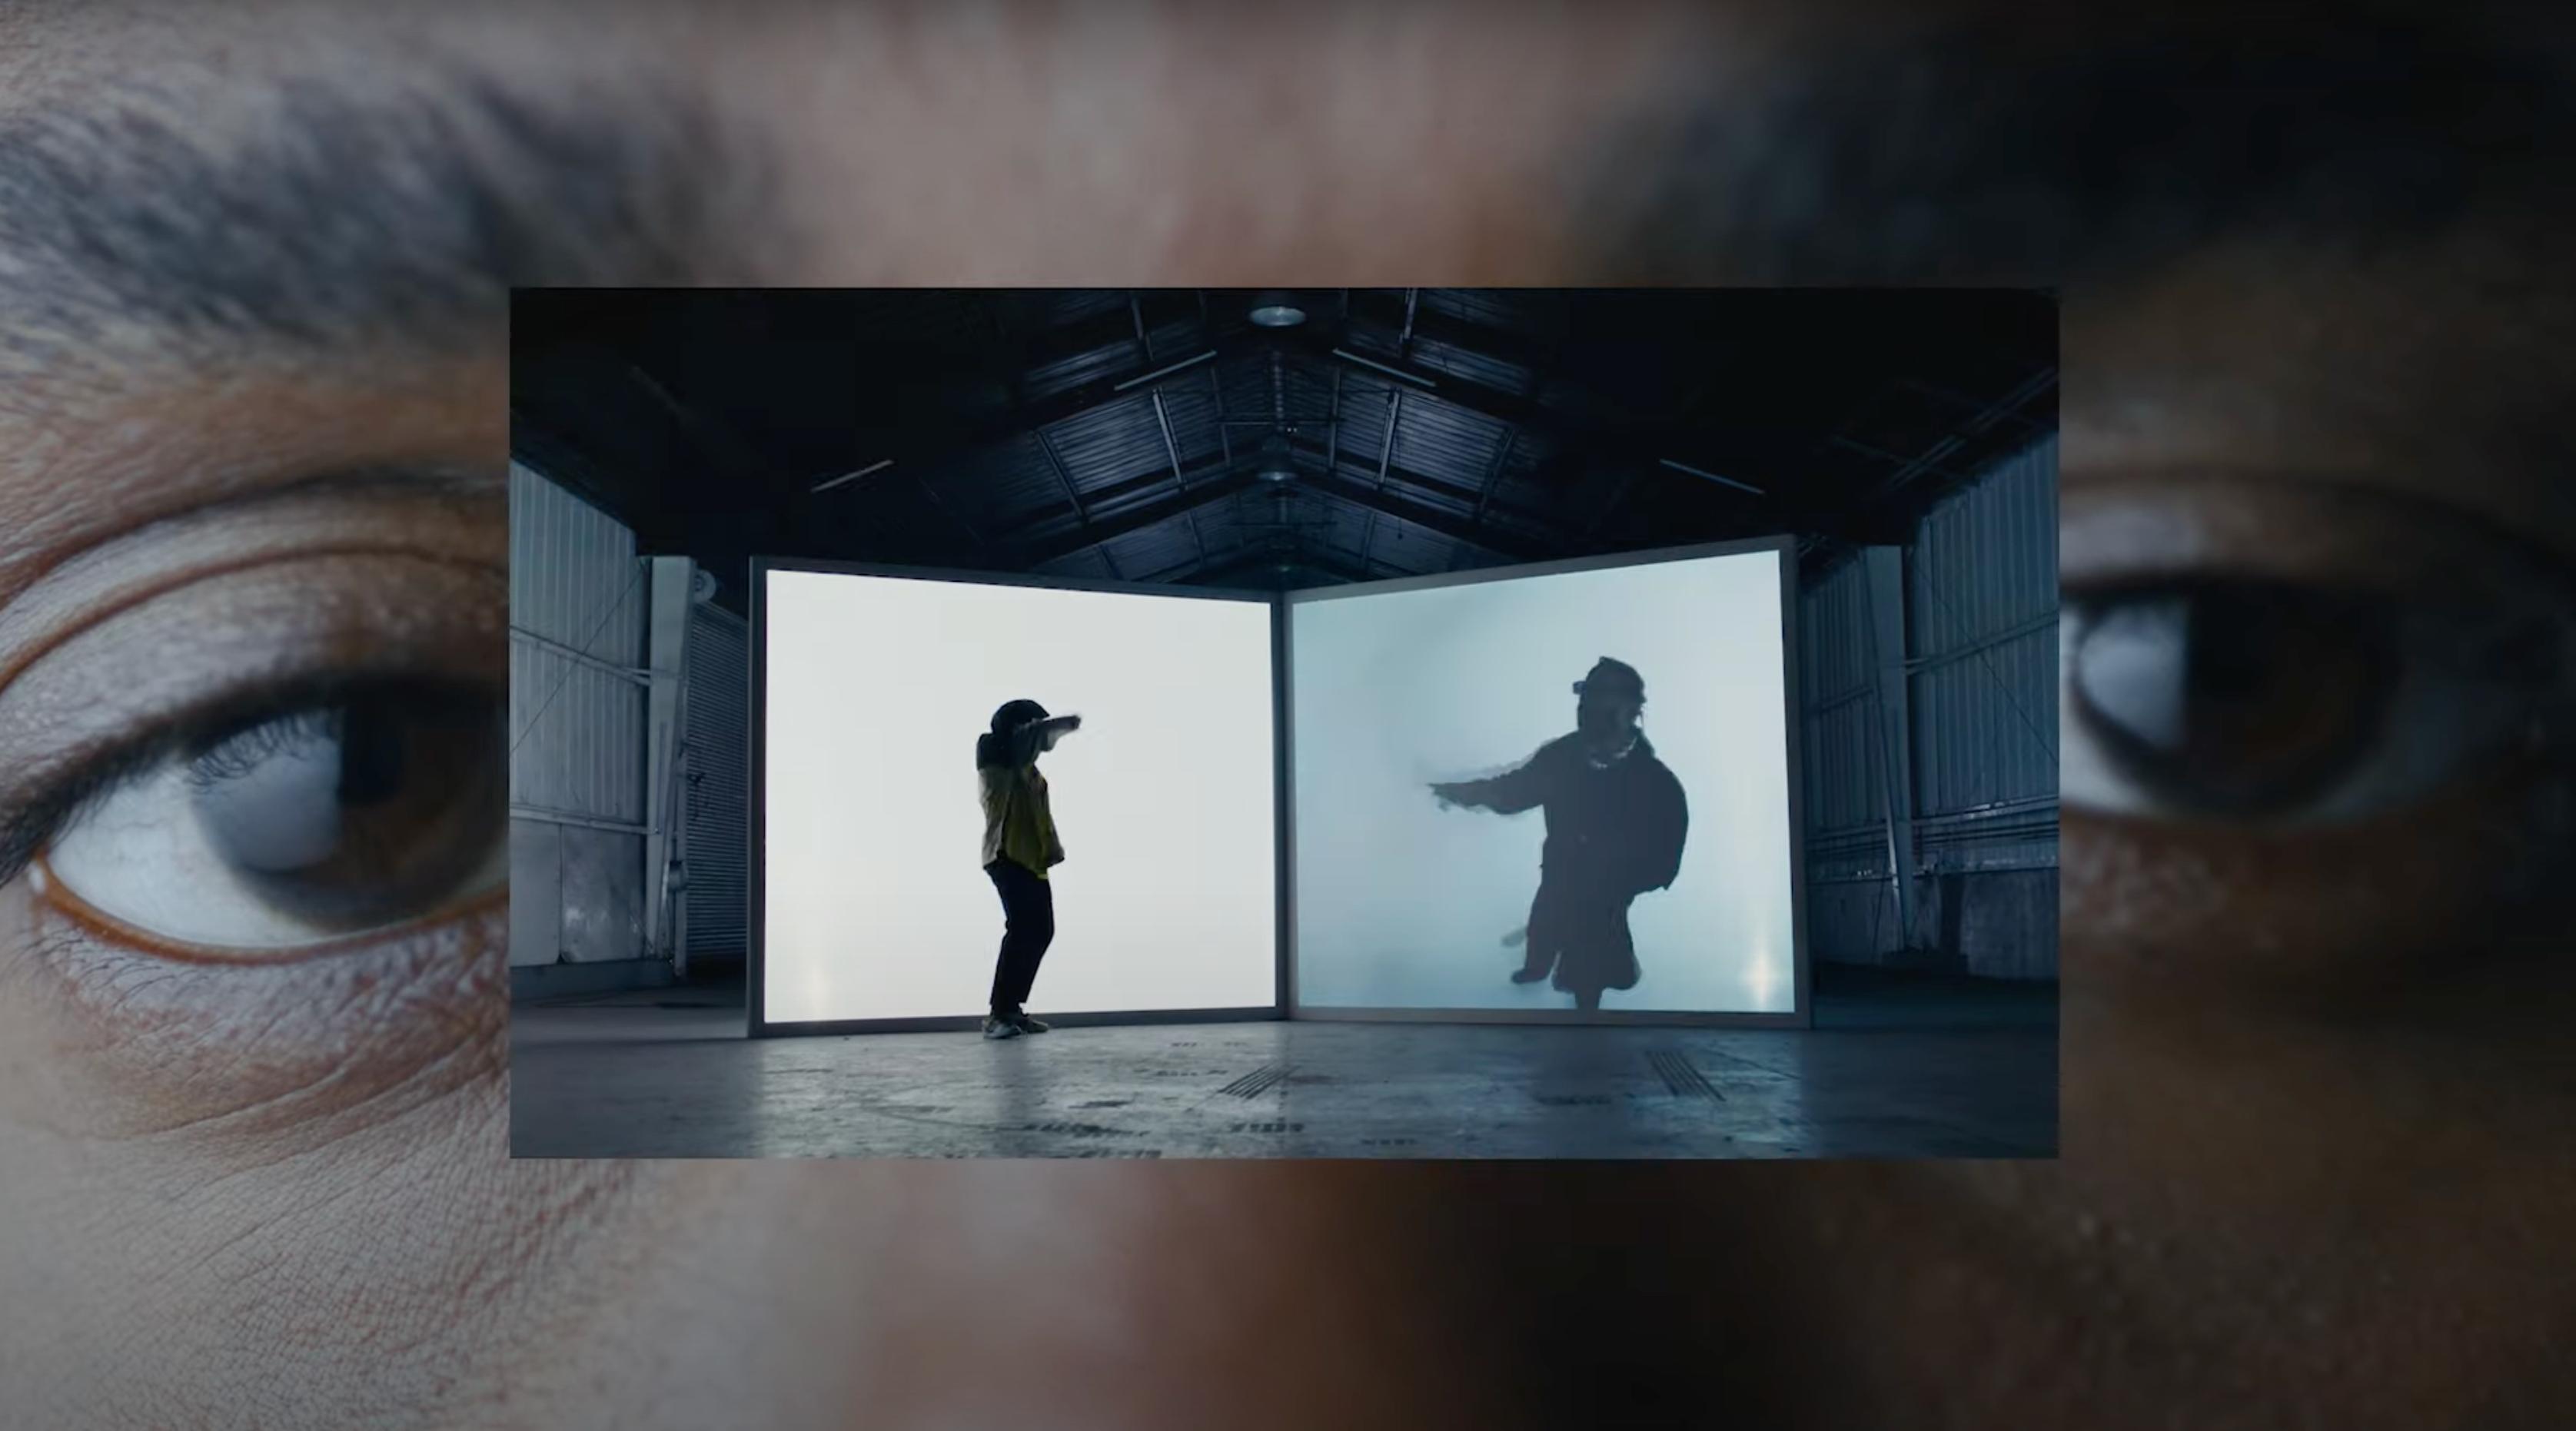 Baby Keem and Kendrick Lamar